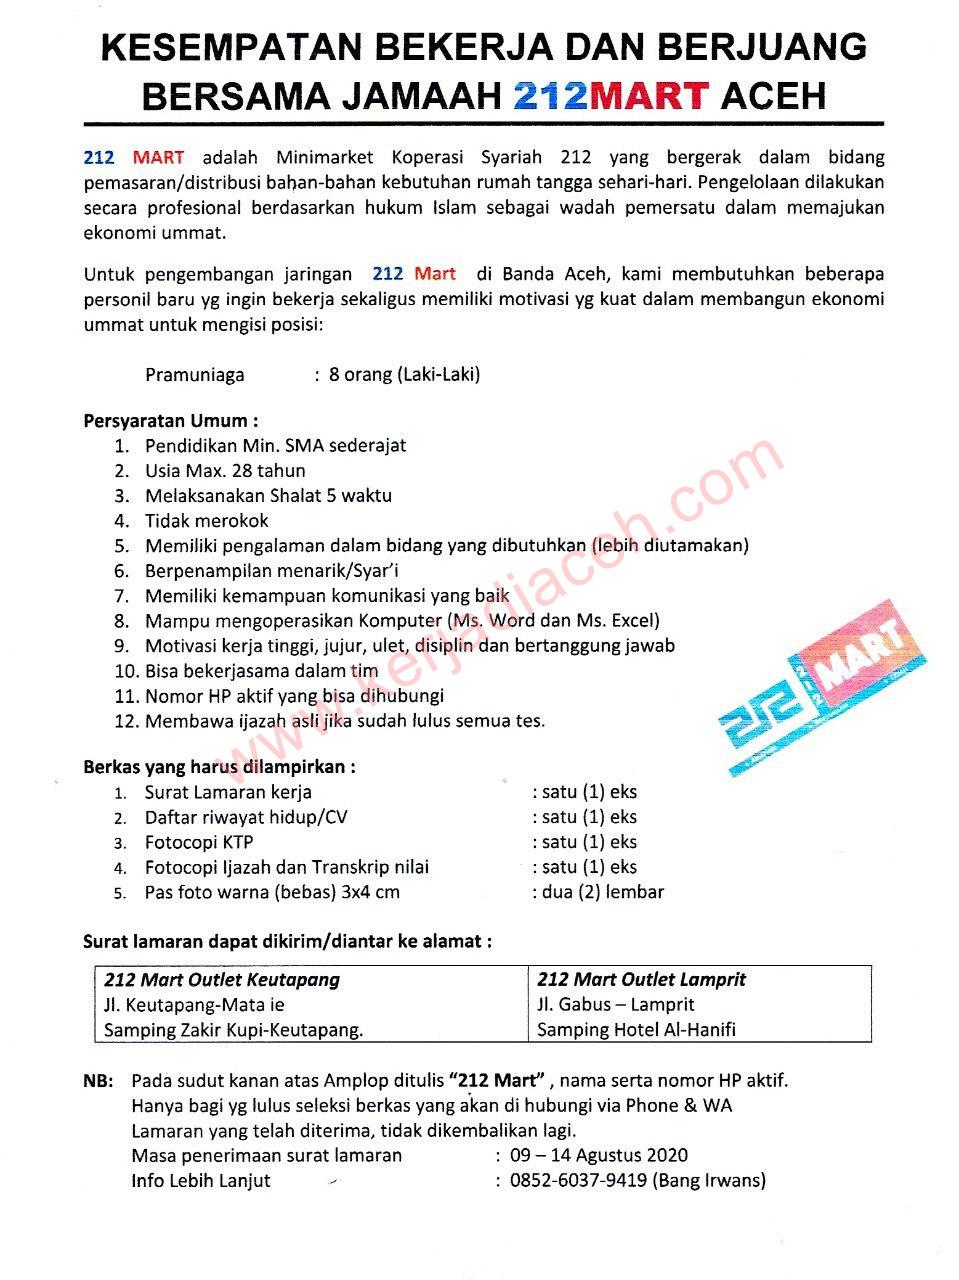 Lowongan Kerja Banda Aceh Agustus 2020